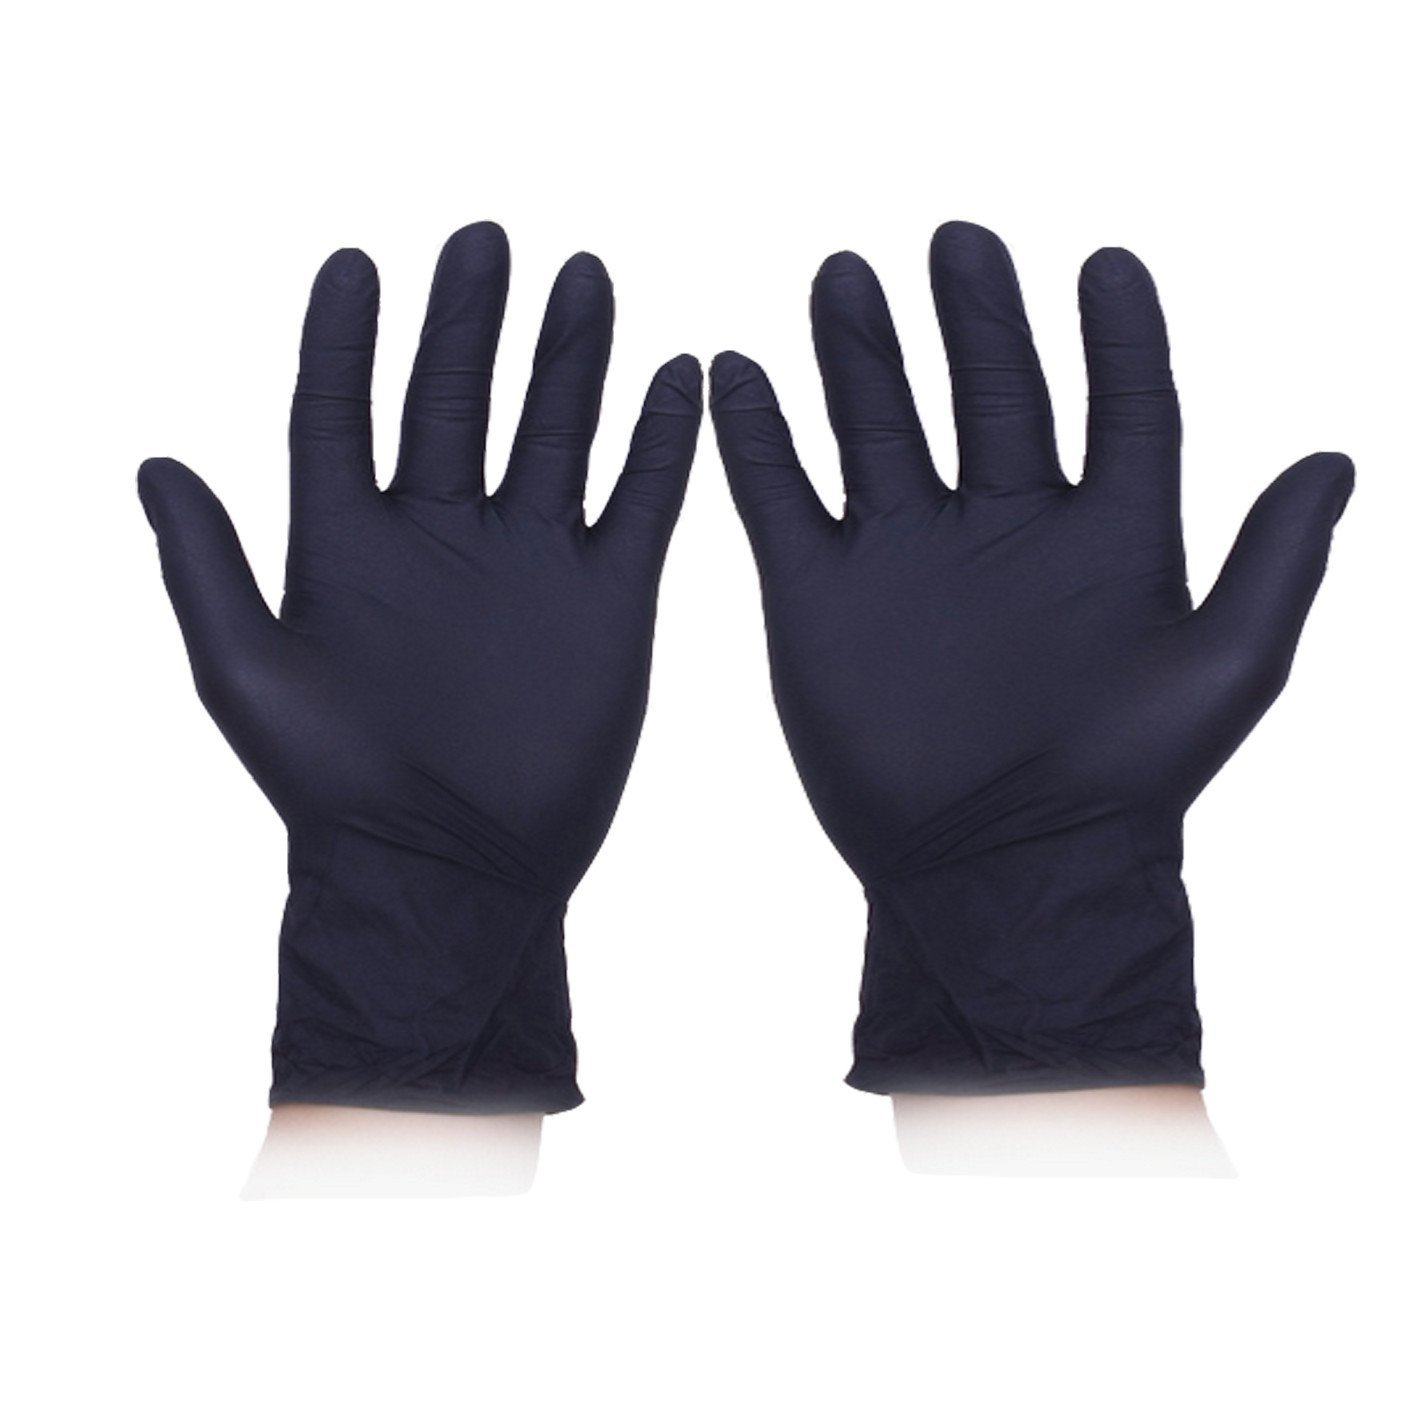 Mishiner 100Pcs Disposable Sterile Nitrile Exam Gloves, anti-static gloves,Powder-Free Suit for home medicine laboratory etc (XL, Black)